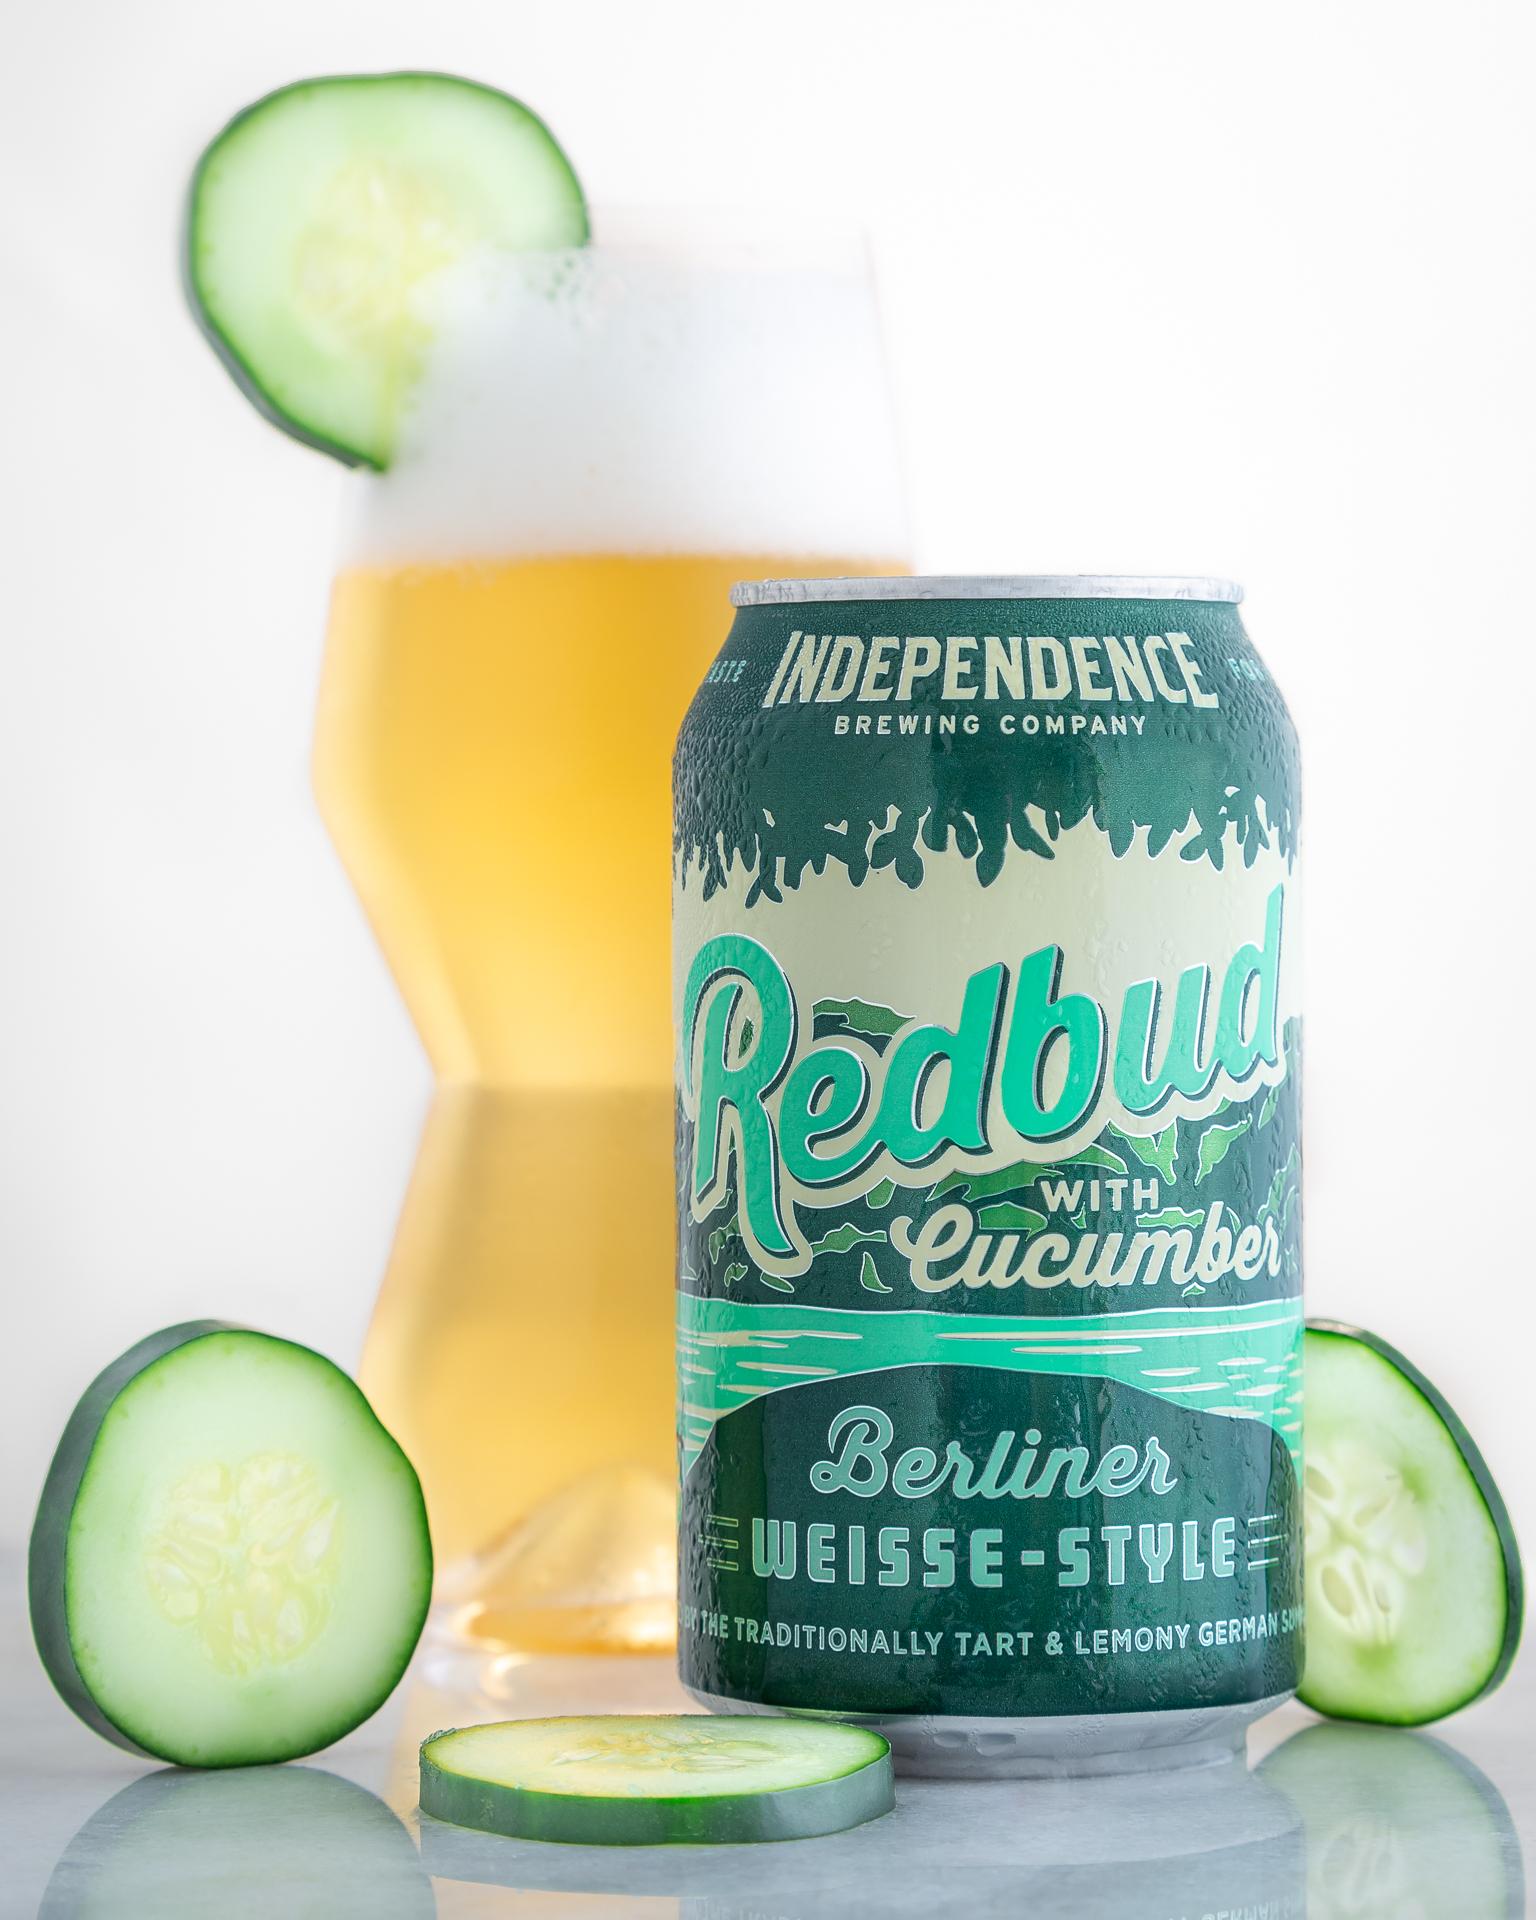 Independence-Cucumber_Redbud.jpg